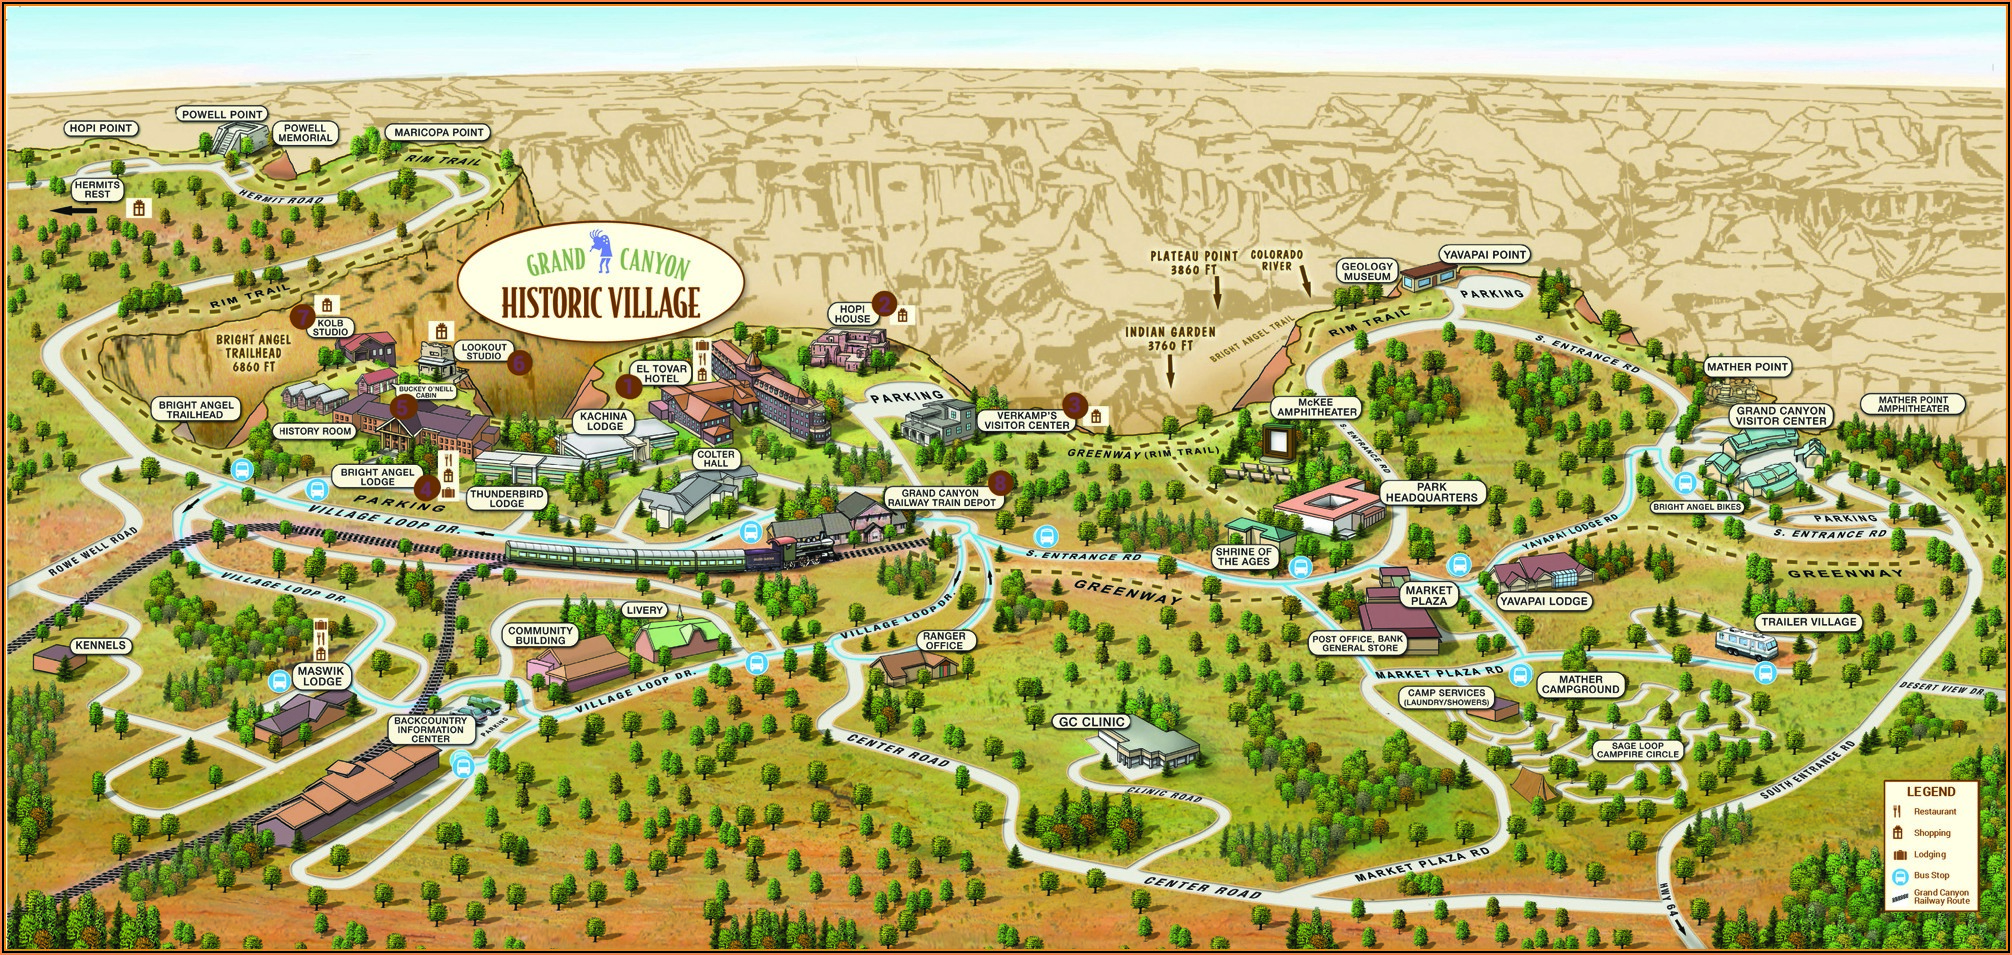 Grand Canyon Lodging South Rim Map